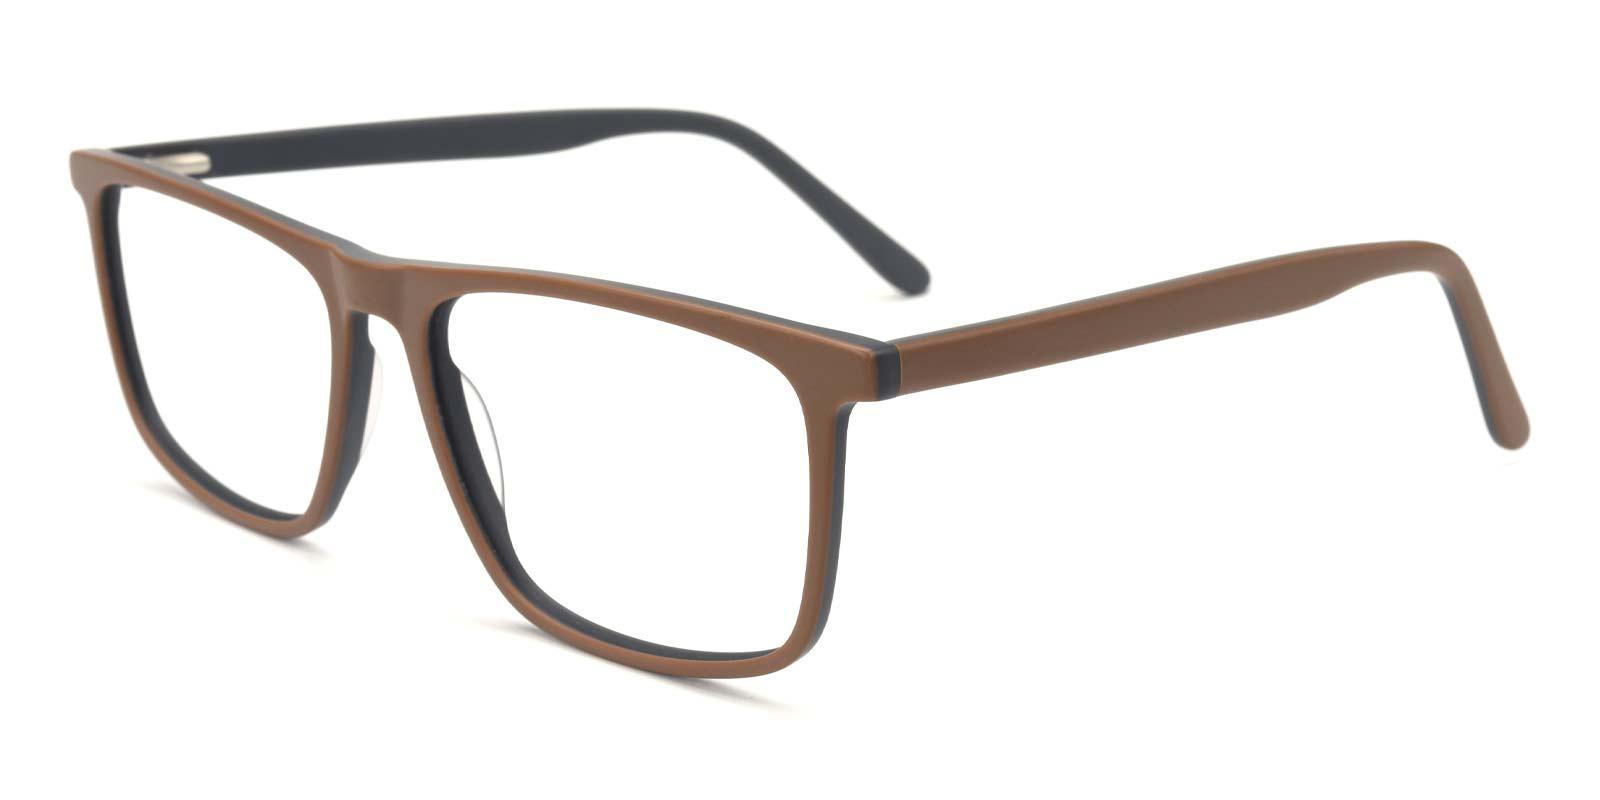 Barbar-Brown-Rectangle-Acetate-Eyeglasses-additional1